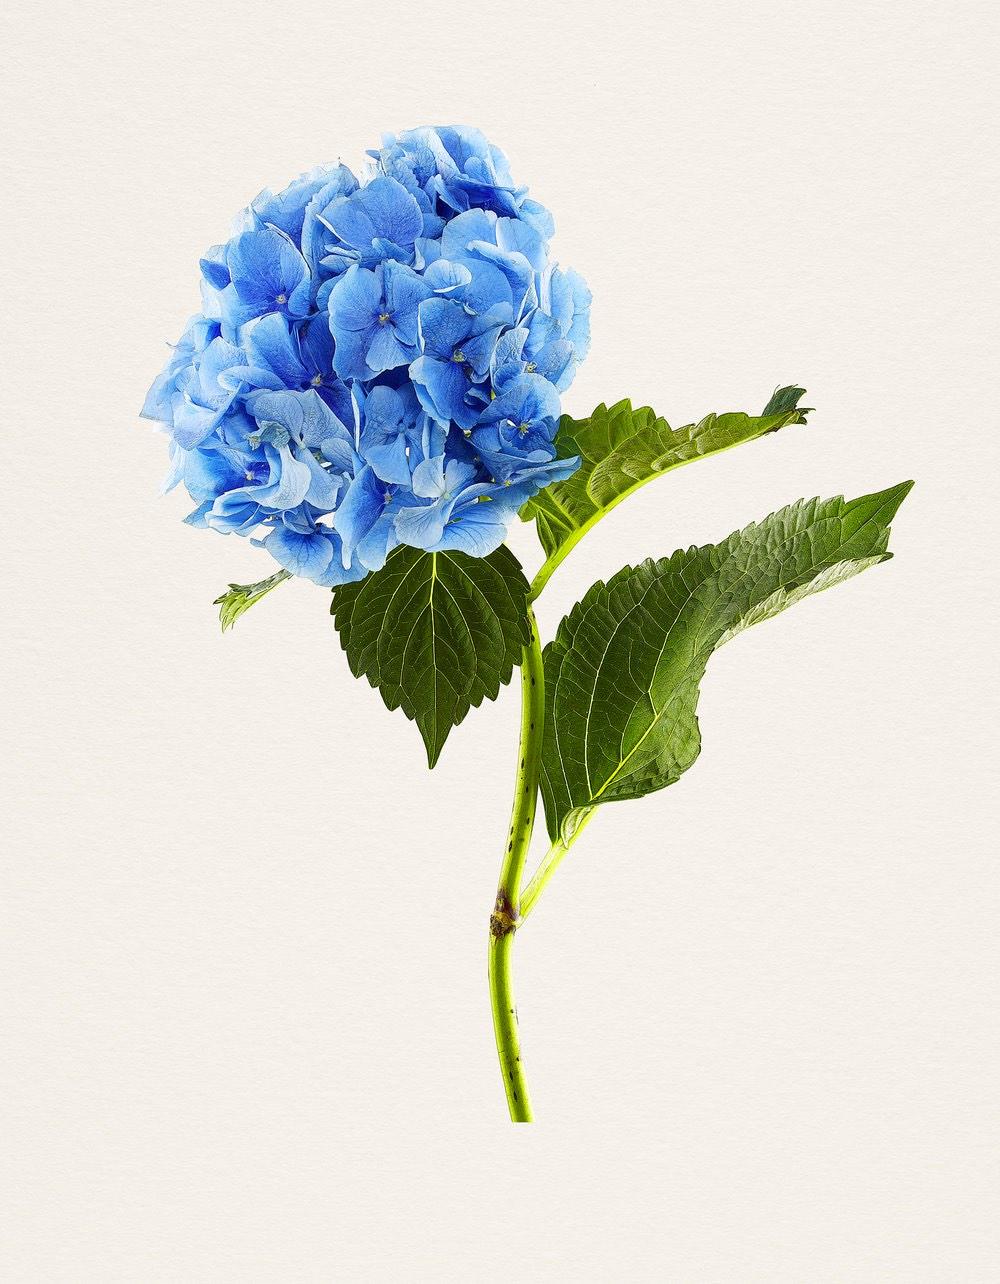 kenji-toma-beautiful-flowers-03.jpg